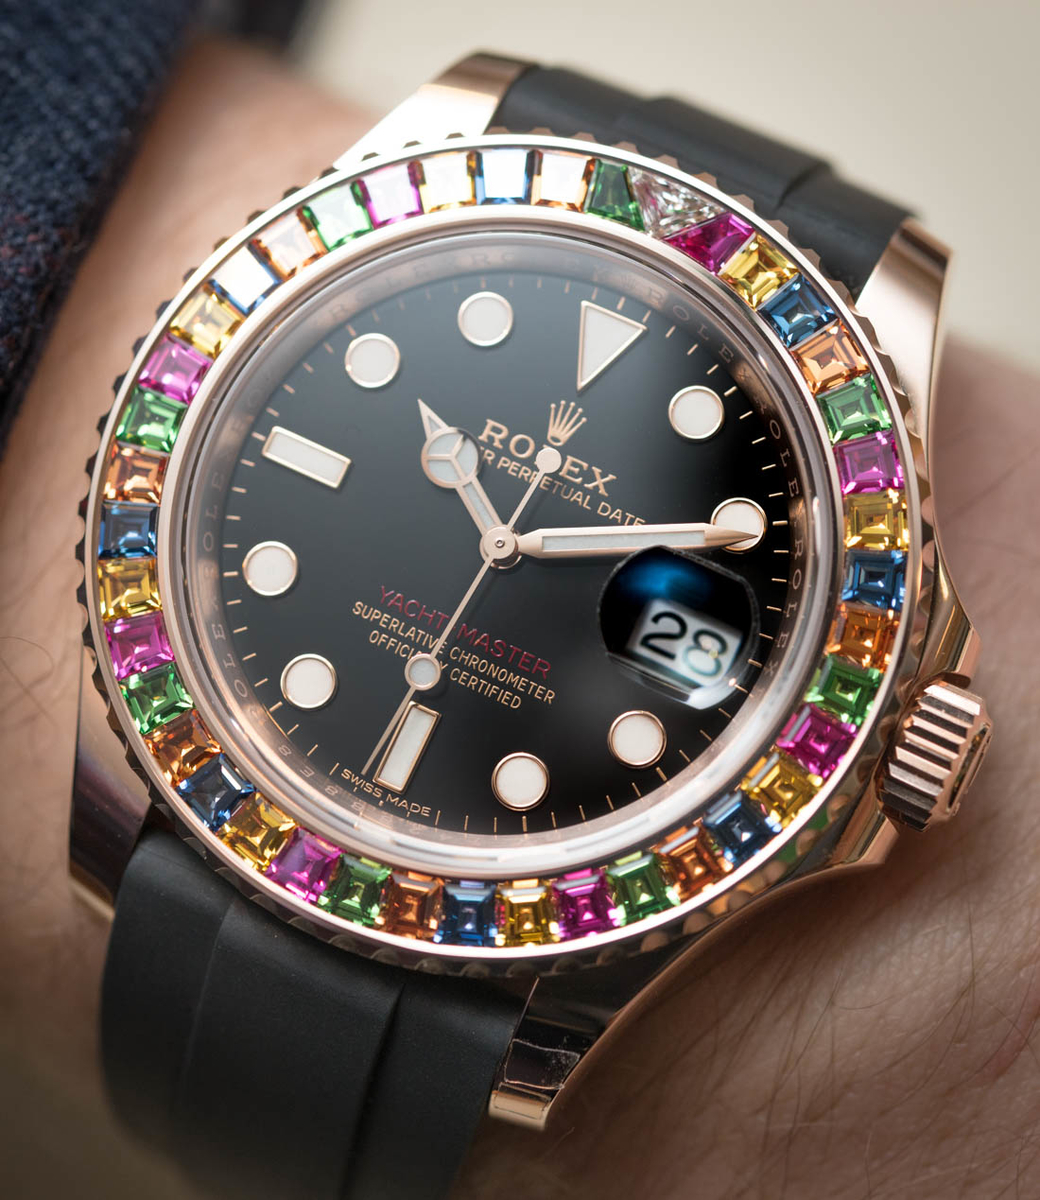 f:id:watchestuualice:20200117152140j:plain